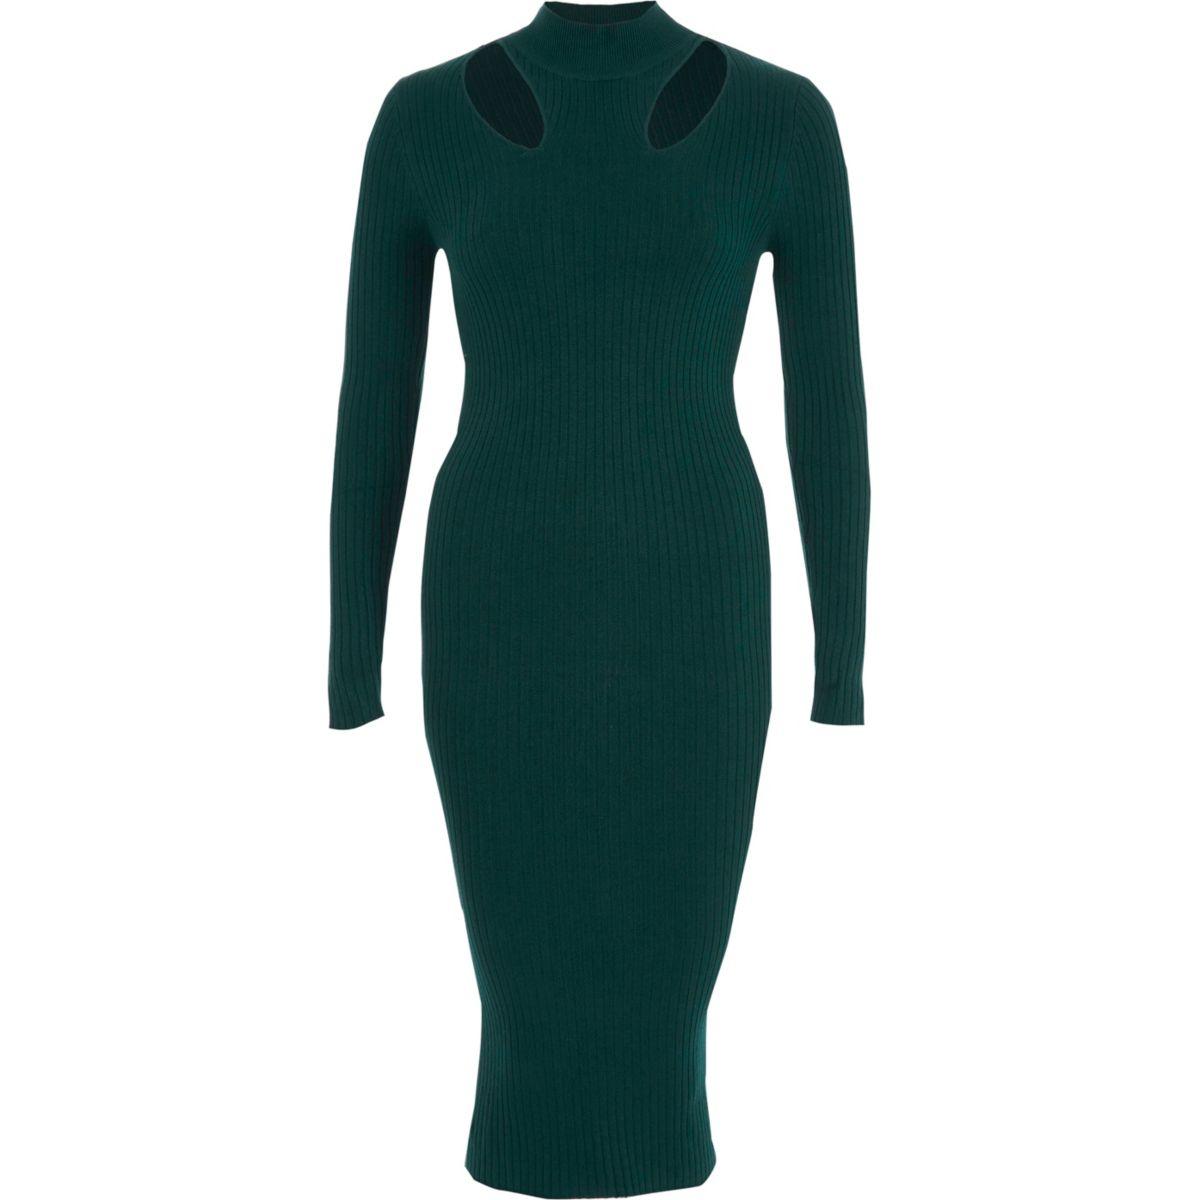 Green ribbed high neck bodycon midi dress